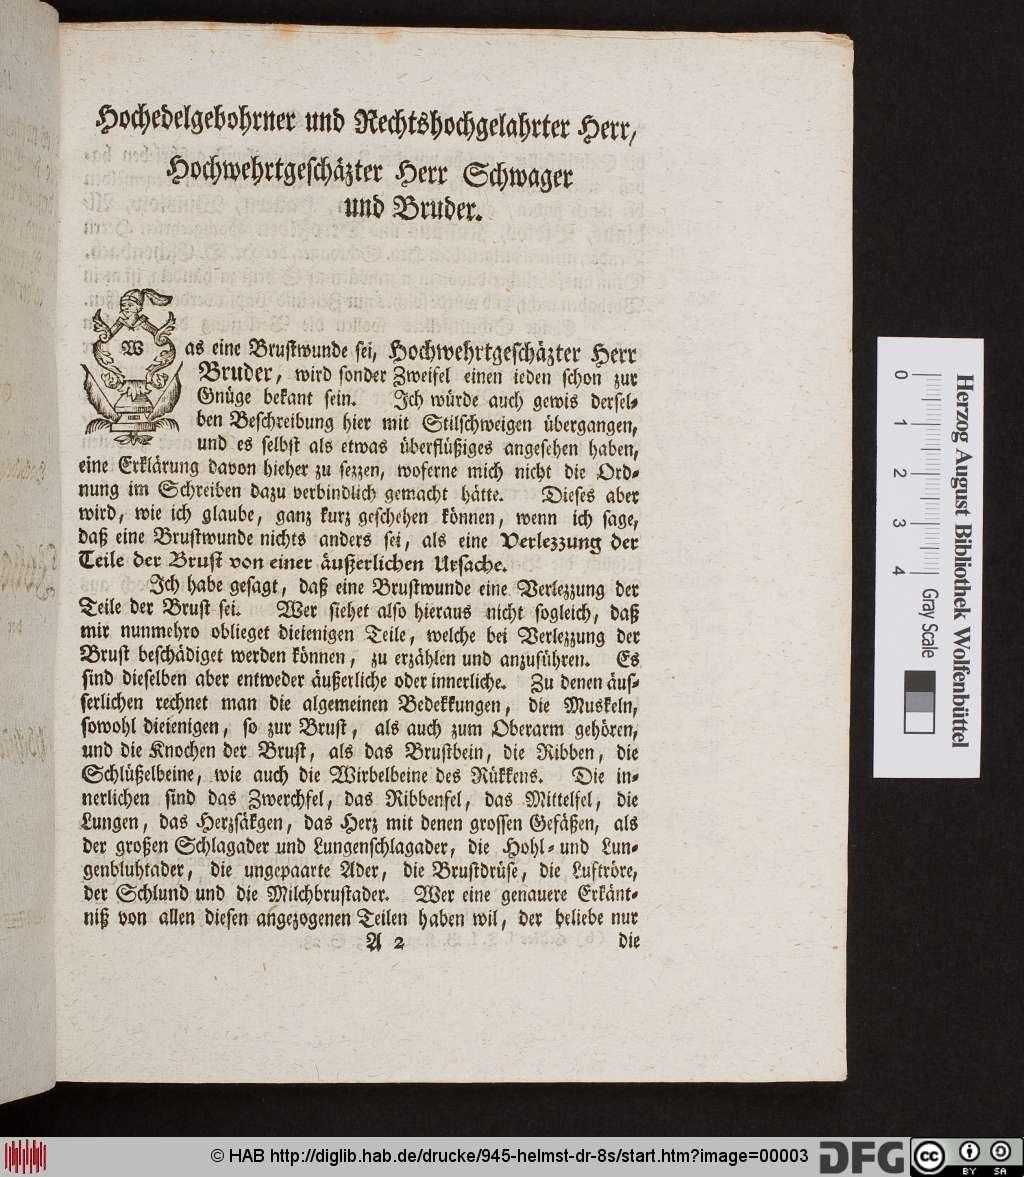 https://diglib.hab.de/drucke/945-helmst-dr-8s/00003.jpg